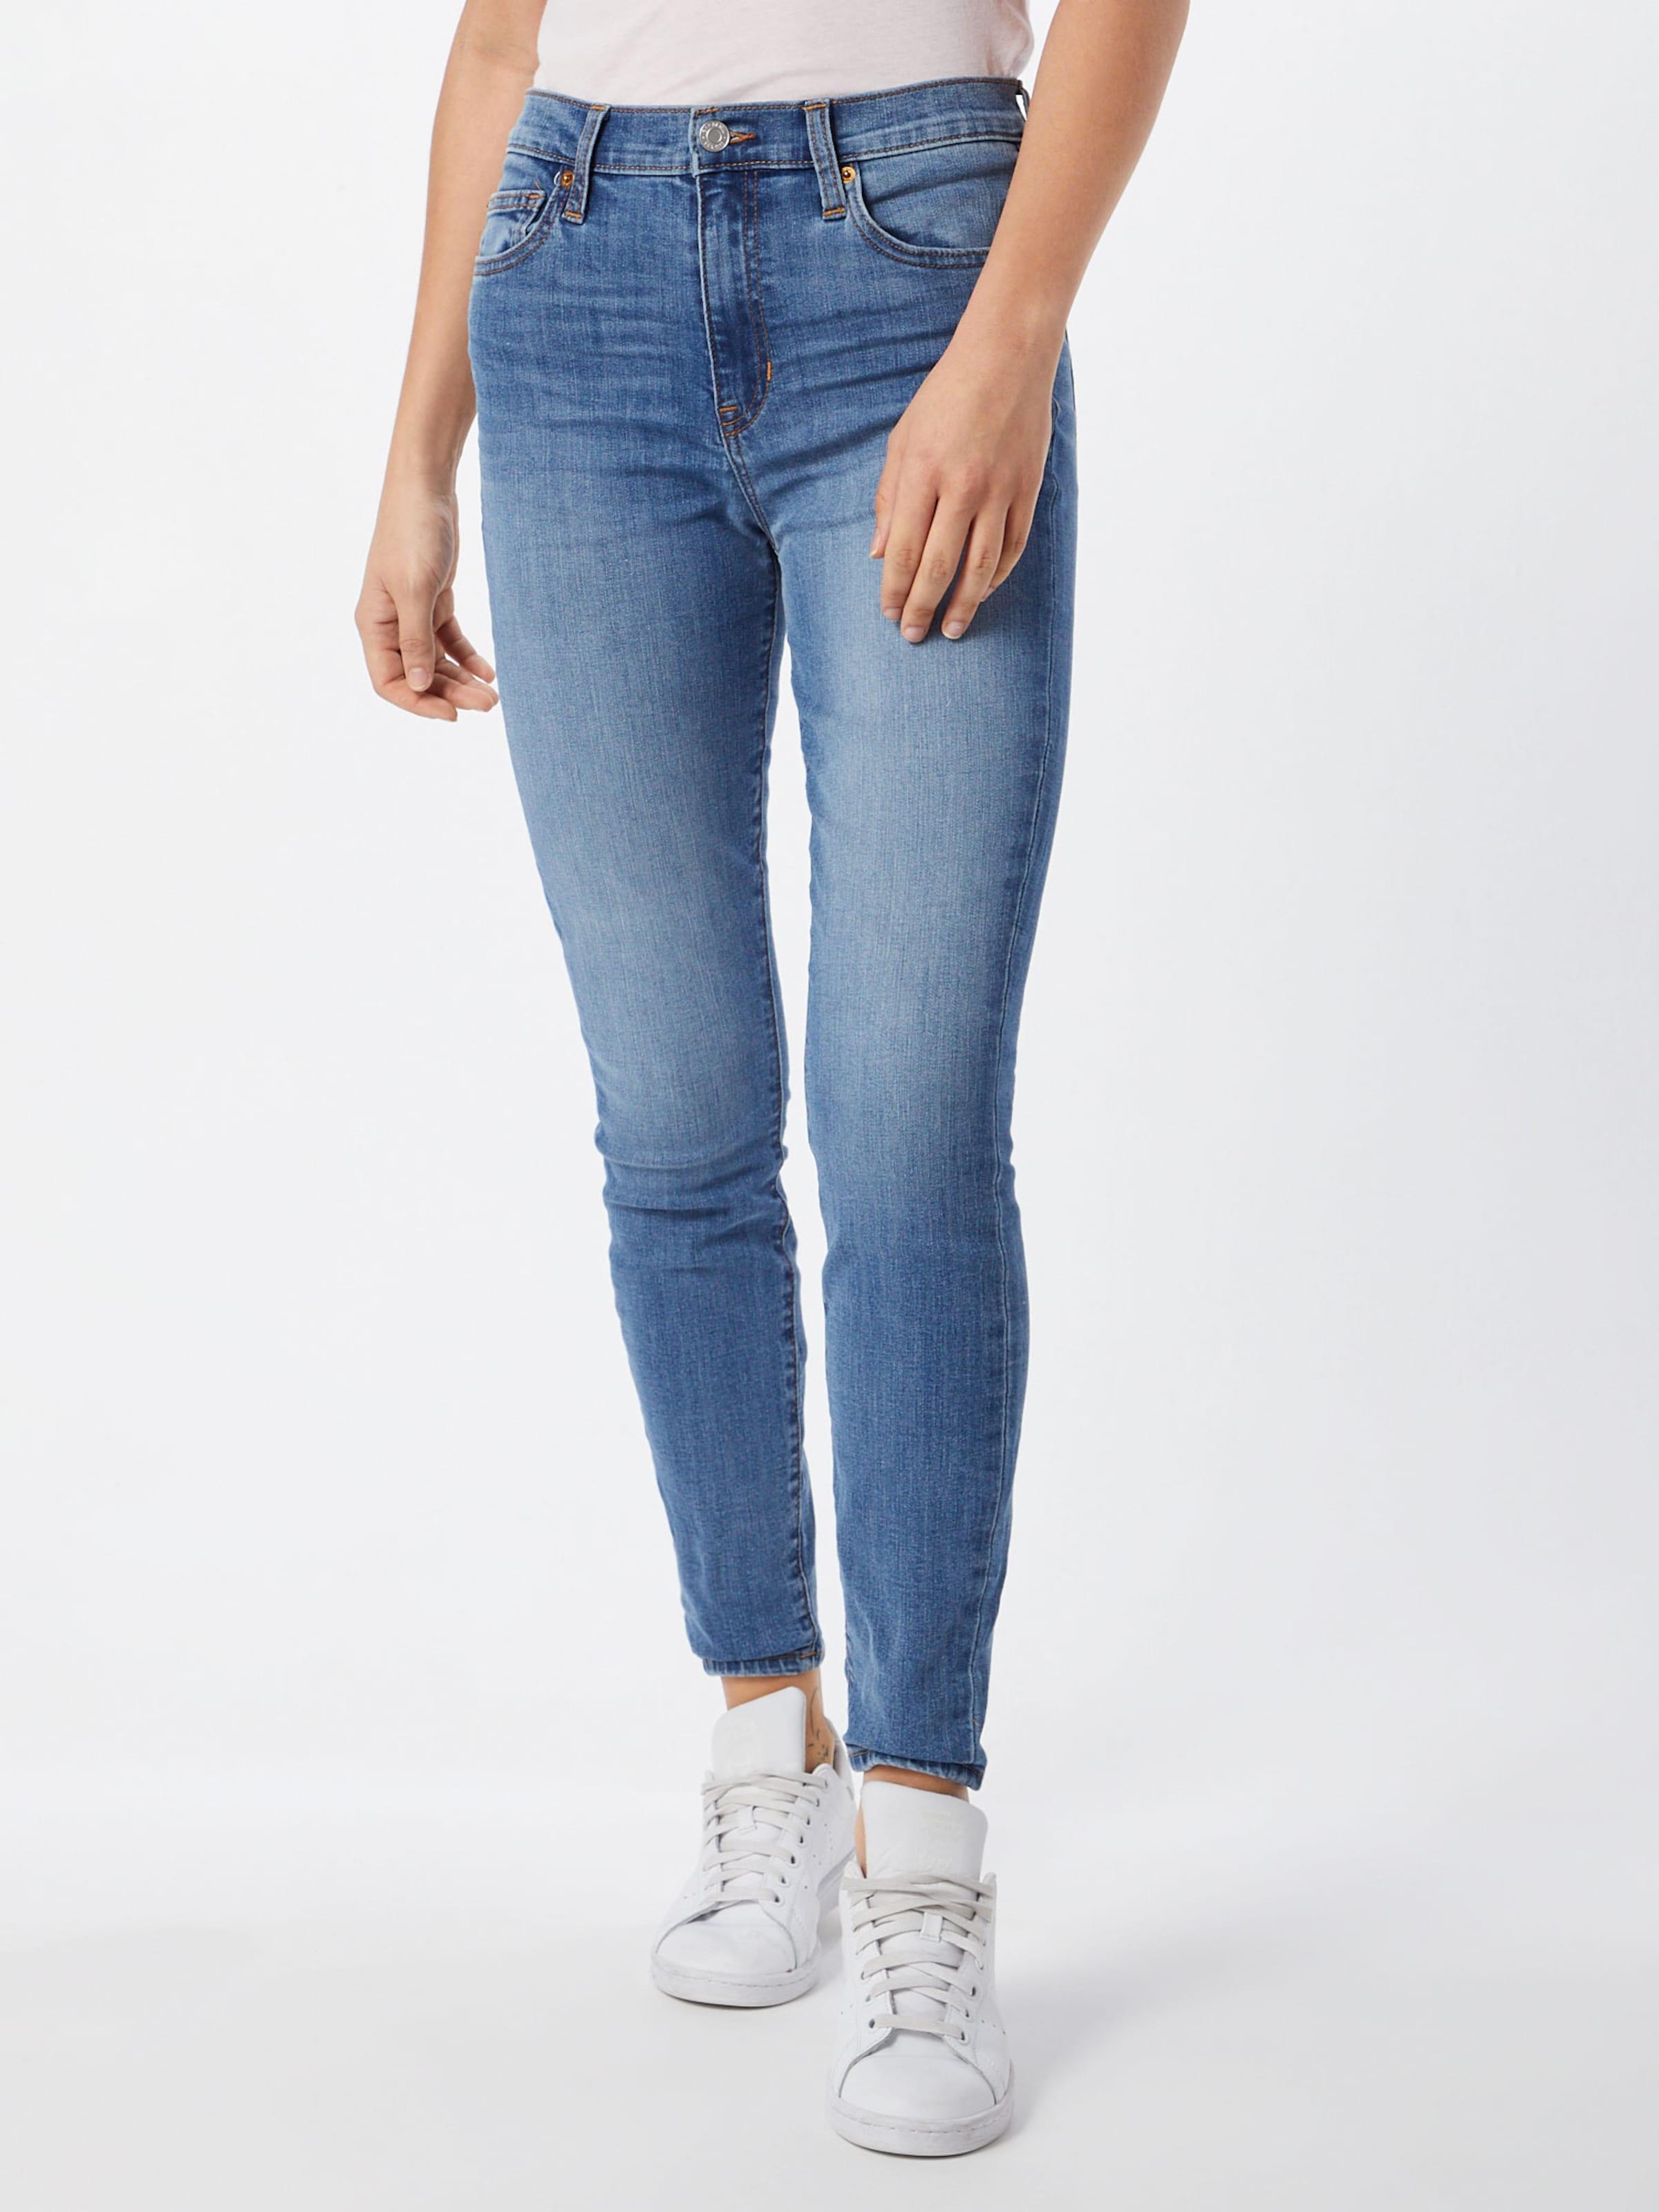 Gap Jeans Gap Blue Jeans Blue Denim Denim In In QrdBWeCxo